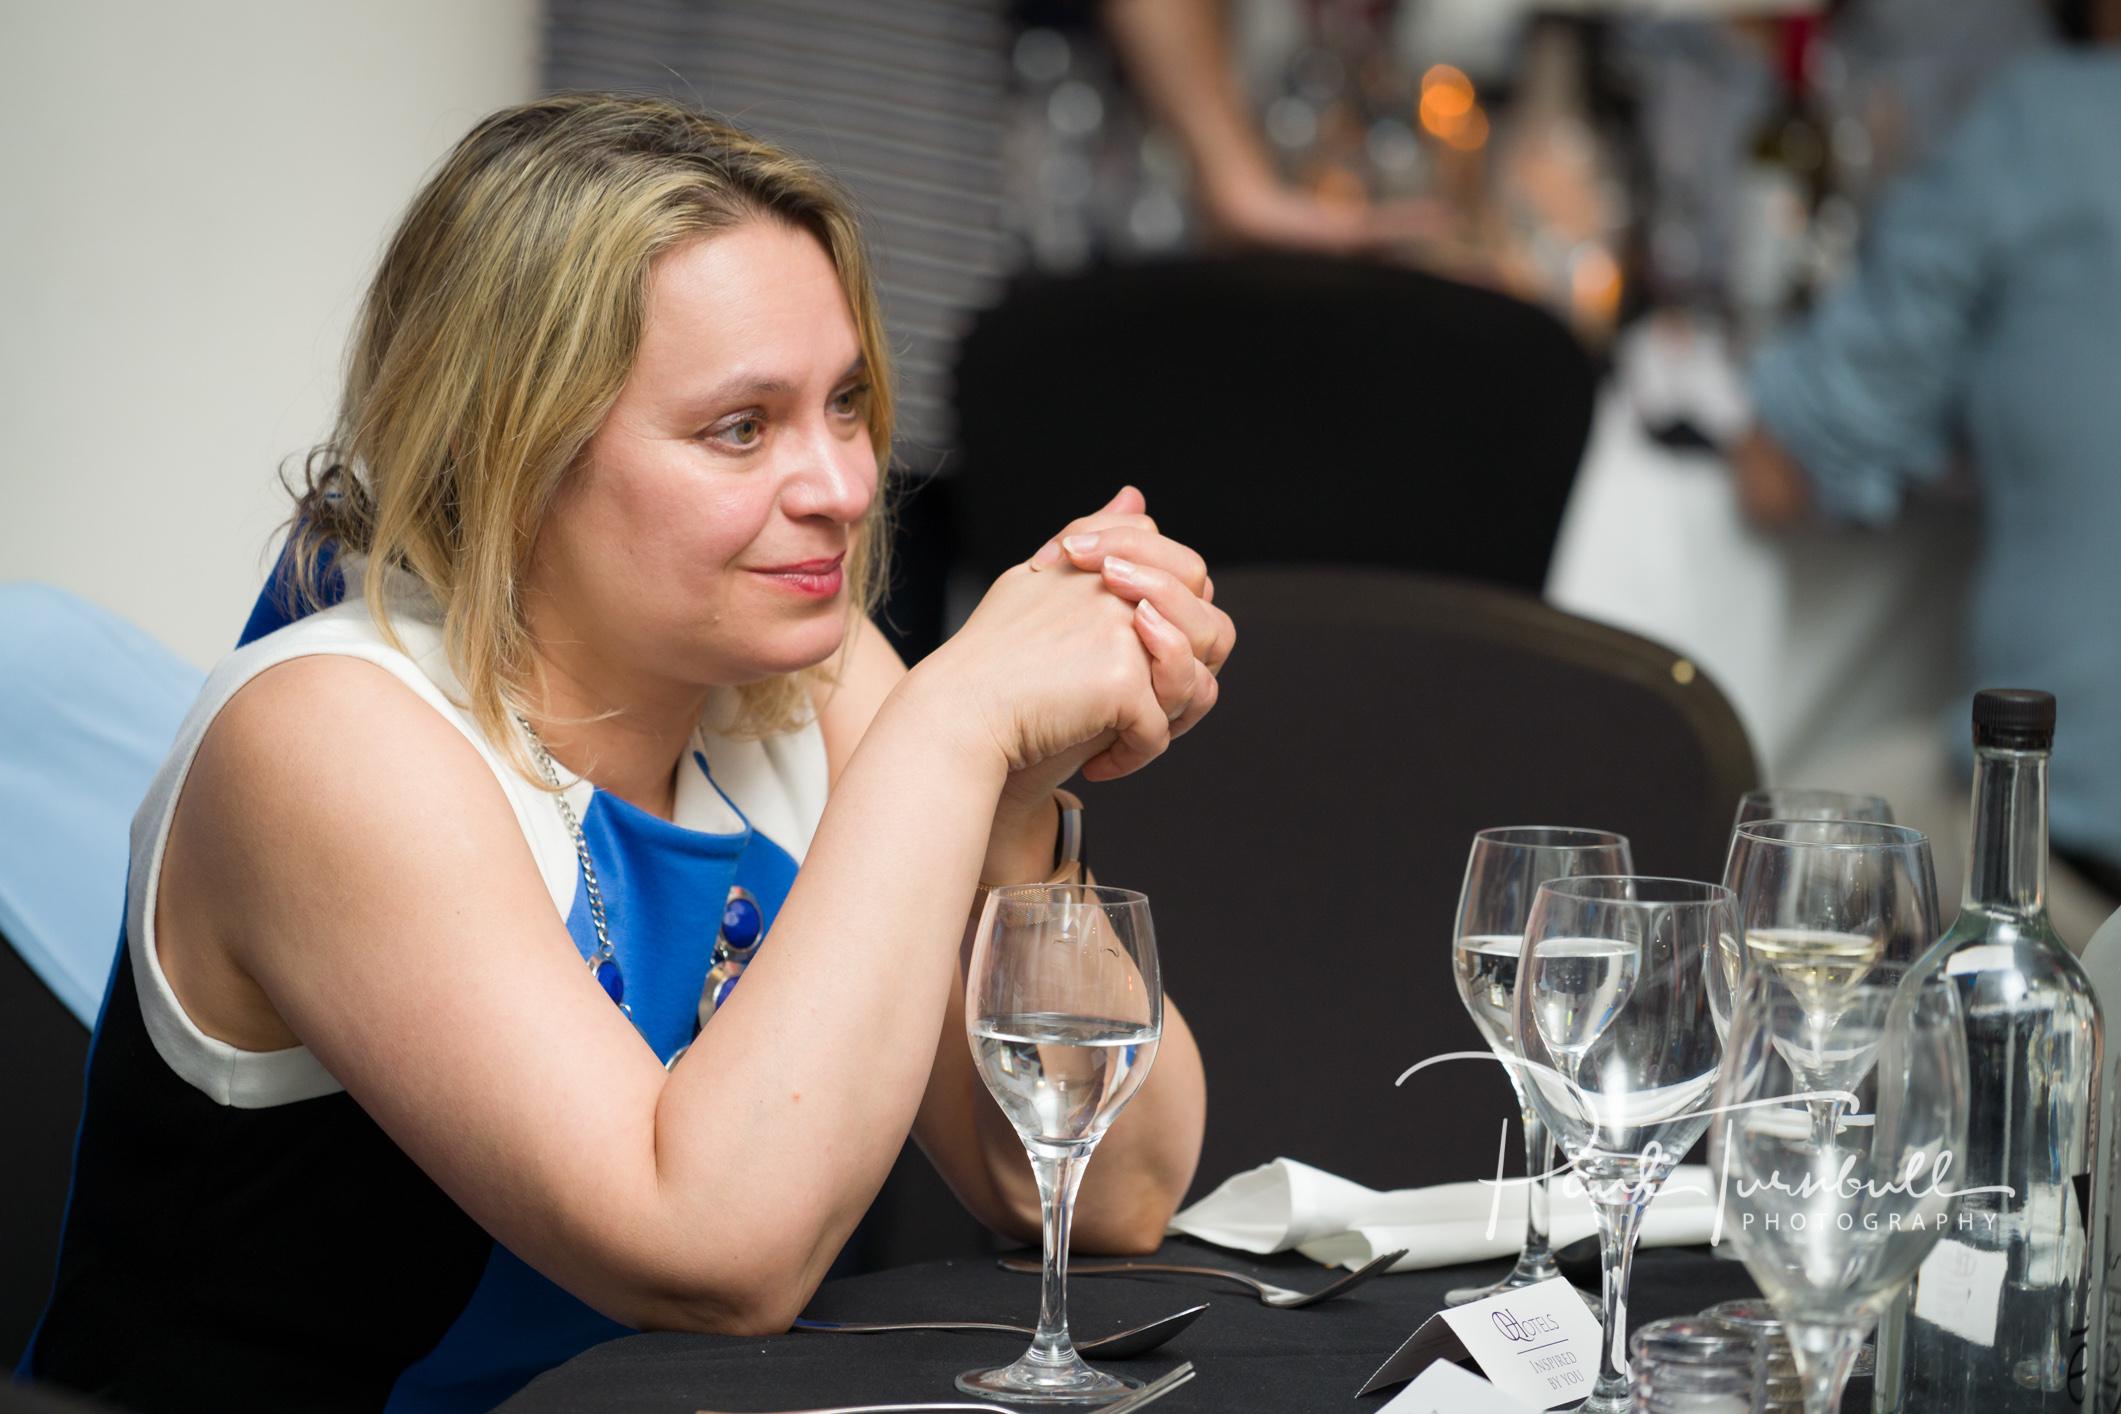 conference-event-photographer-queens-hotel-leeds-yorkshire-026.jpg